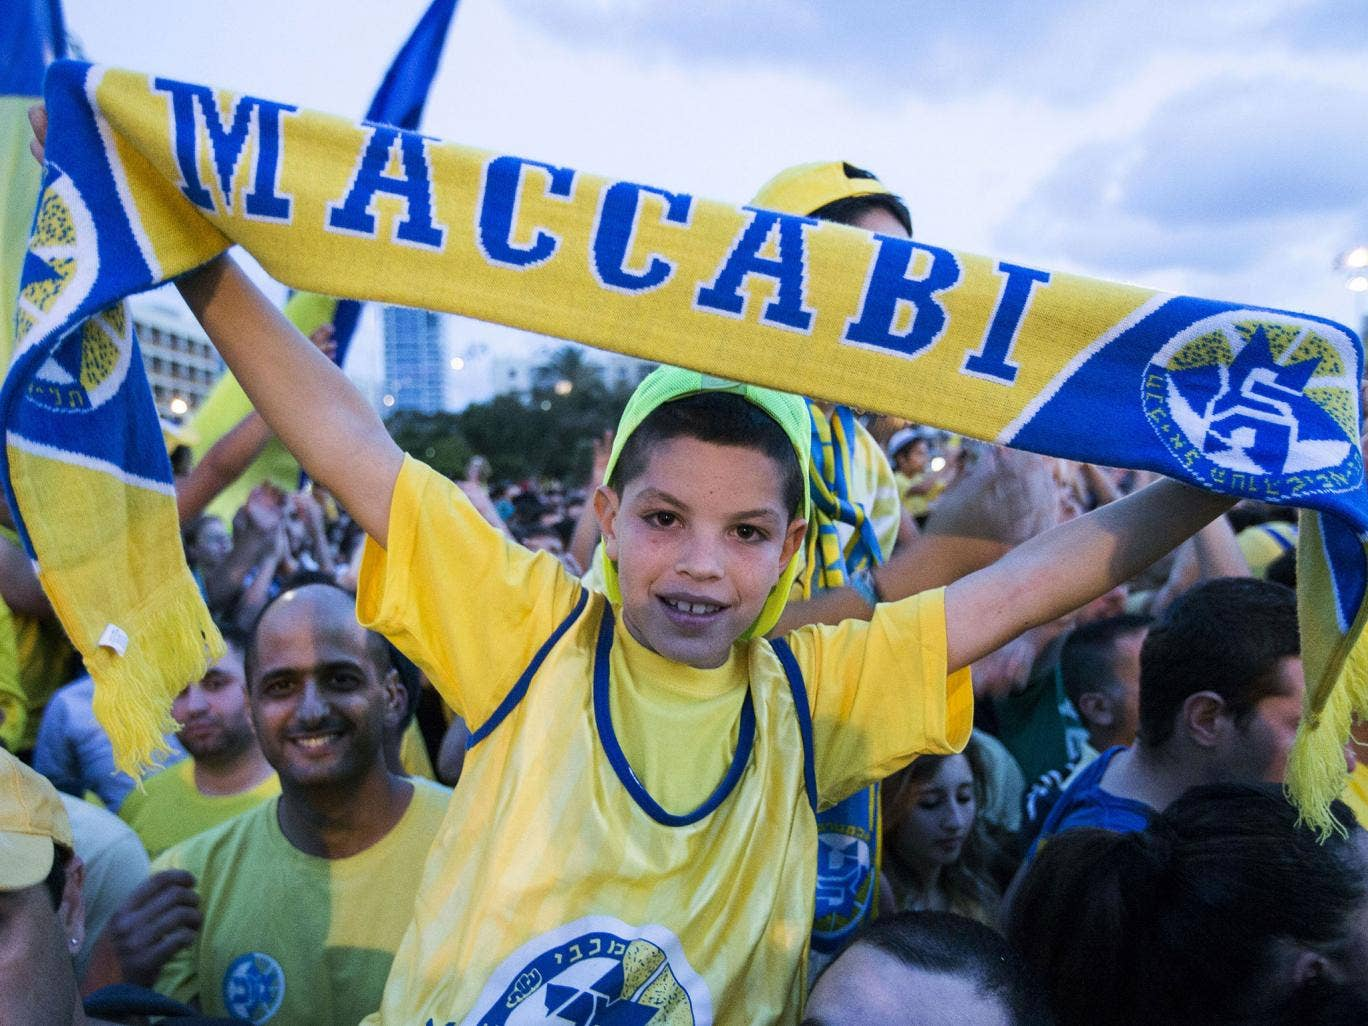 Maccabi Tel Aviv fans celebrate their team's win in Kikar Rabin or Rabin Square in Tel Aviv, on May 19, 2014, following last night's victory over Real Madrid in the Euroleague 2014